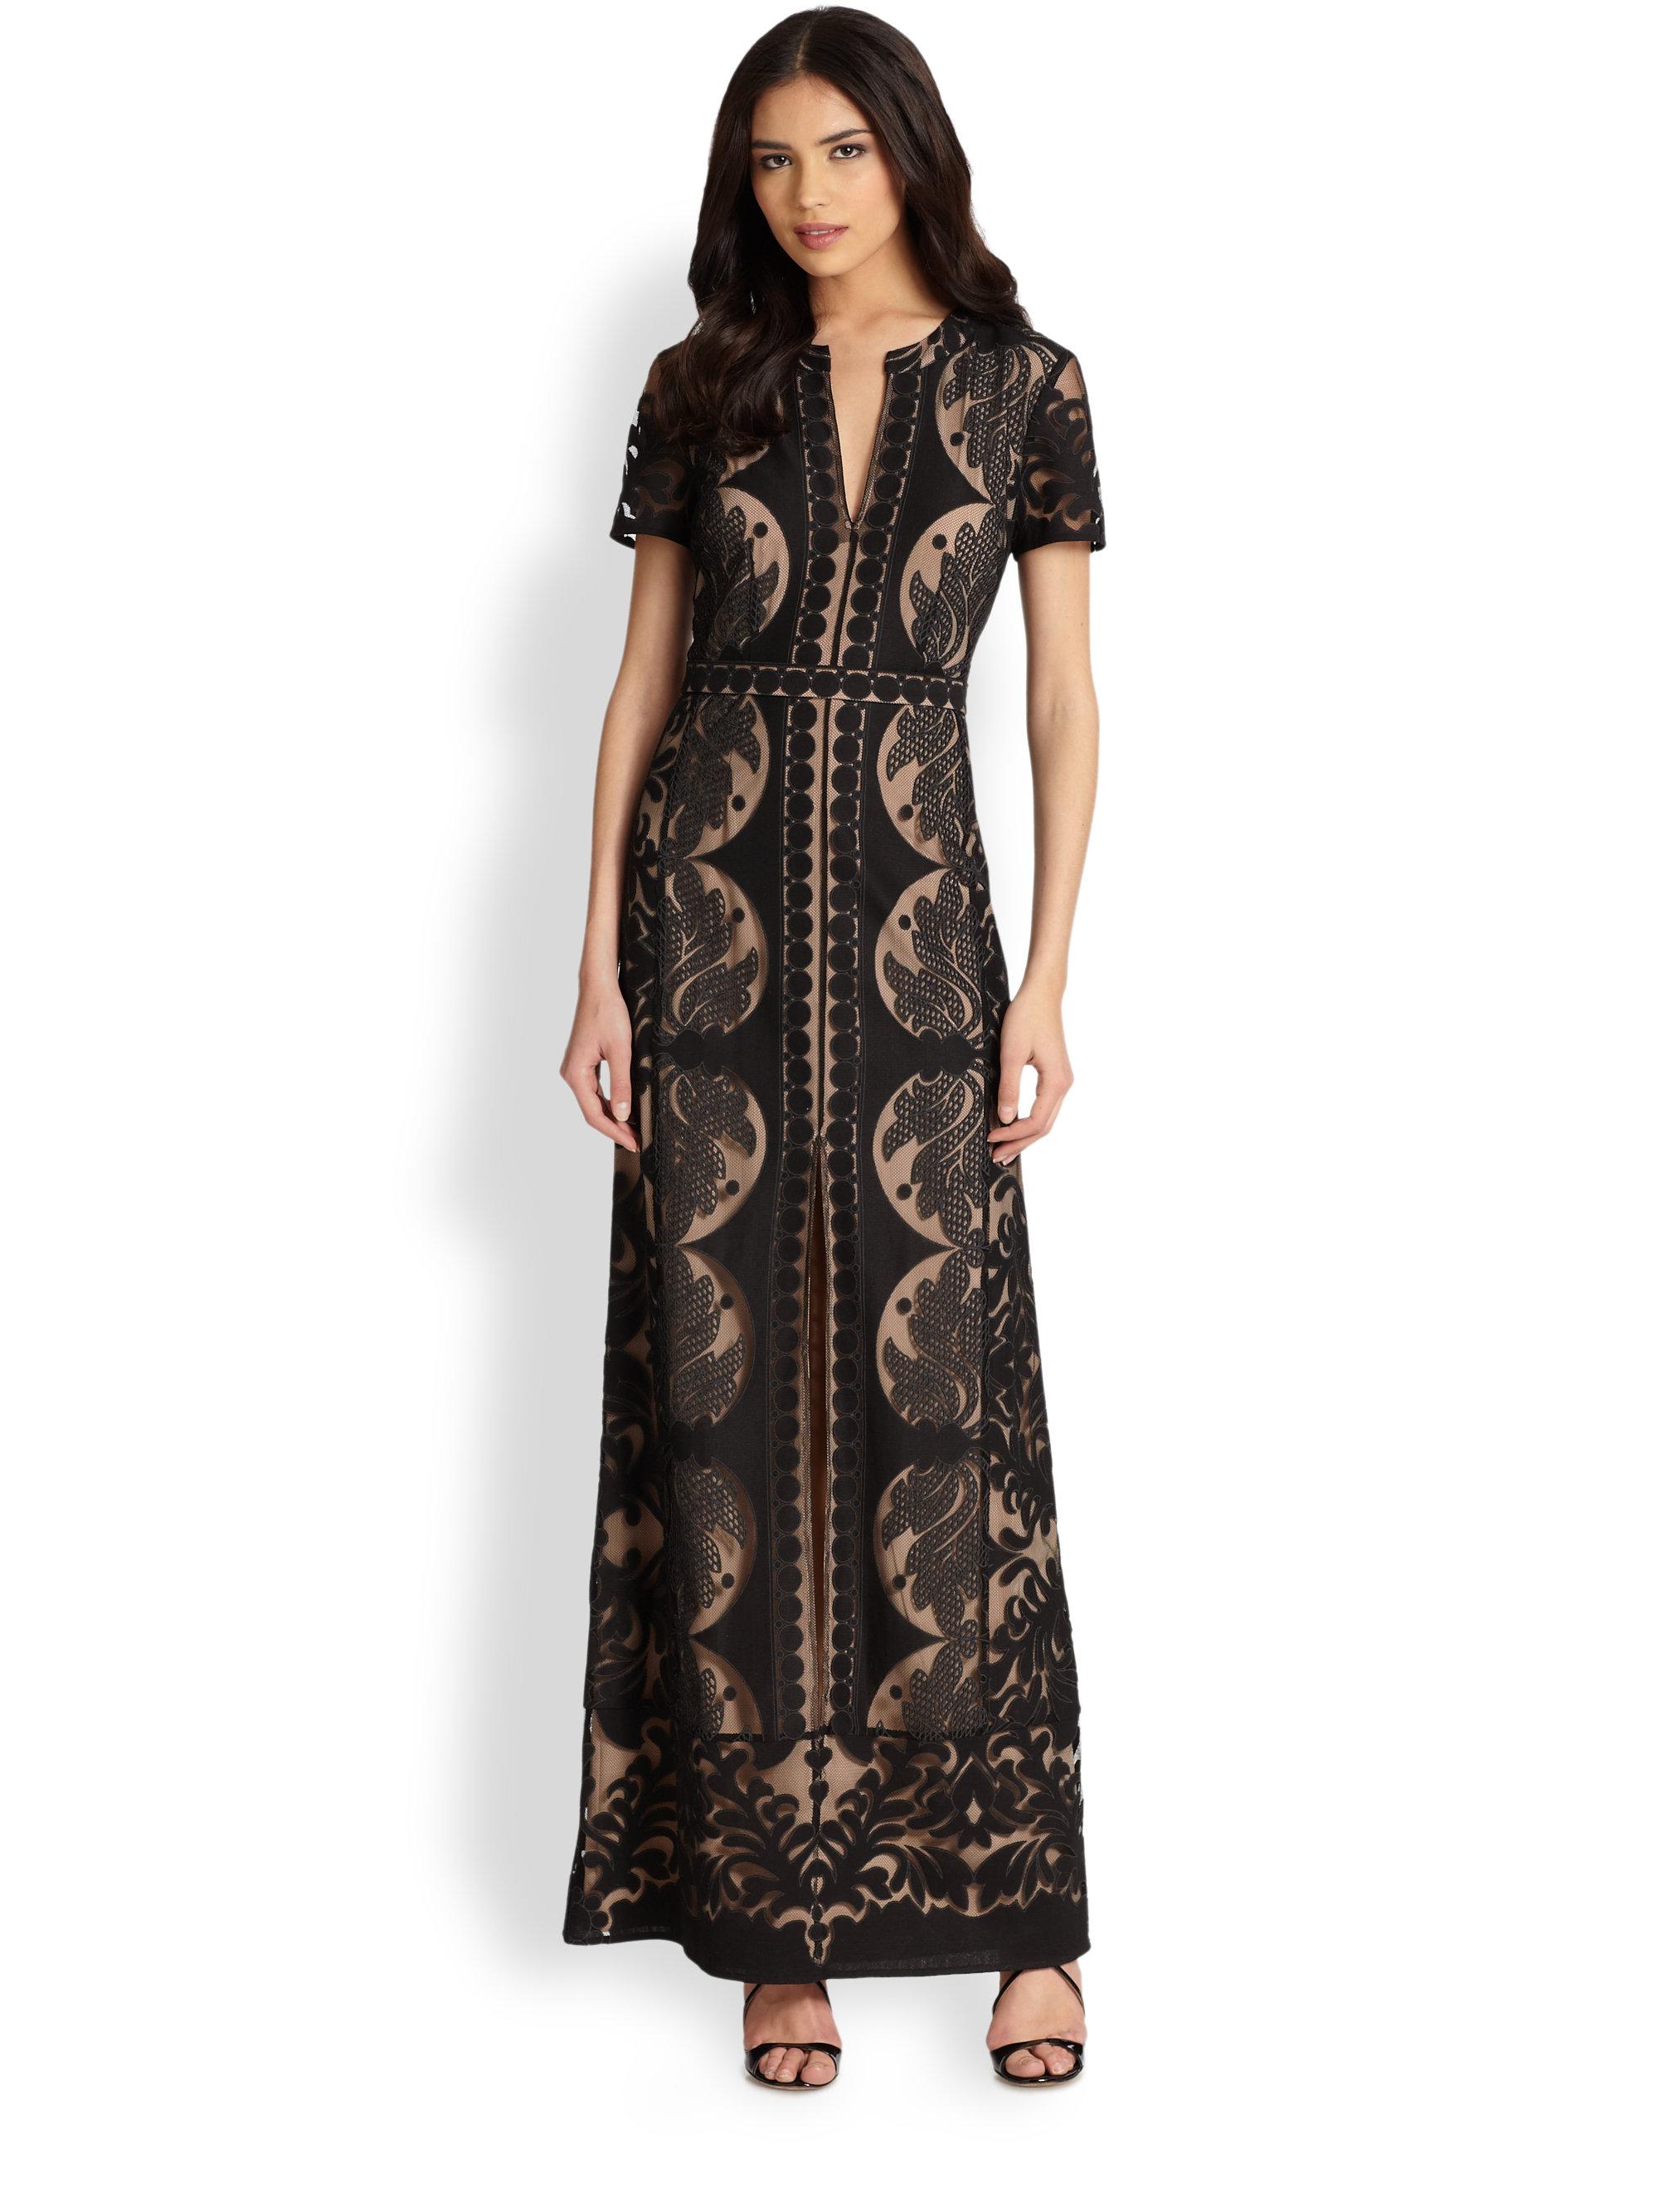 Bcbgmaxazria Cailean Lace Maxi Dress In Black Lyst